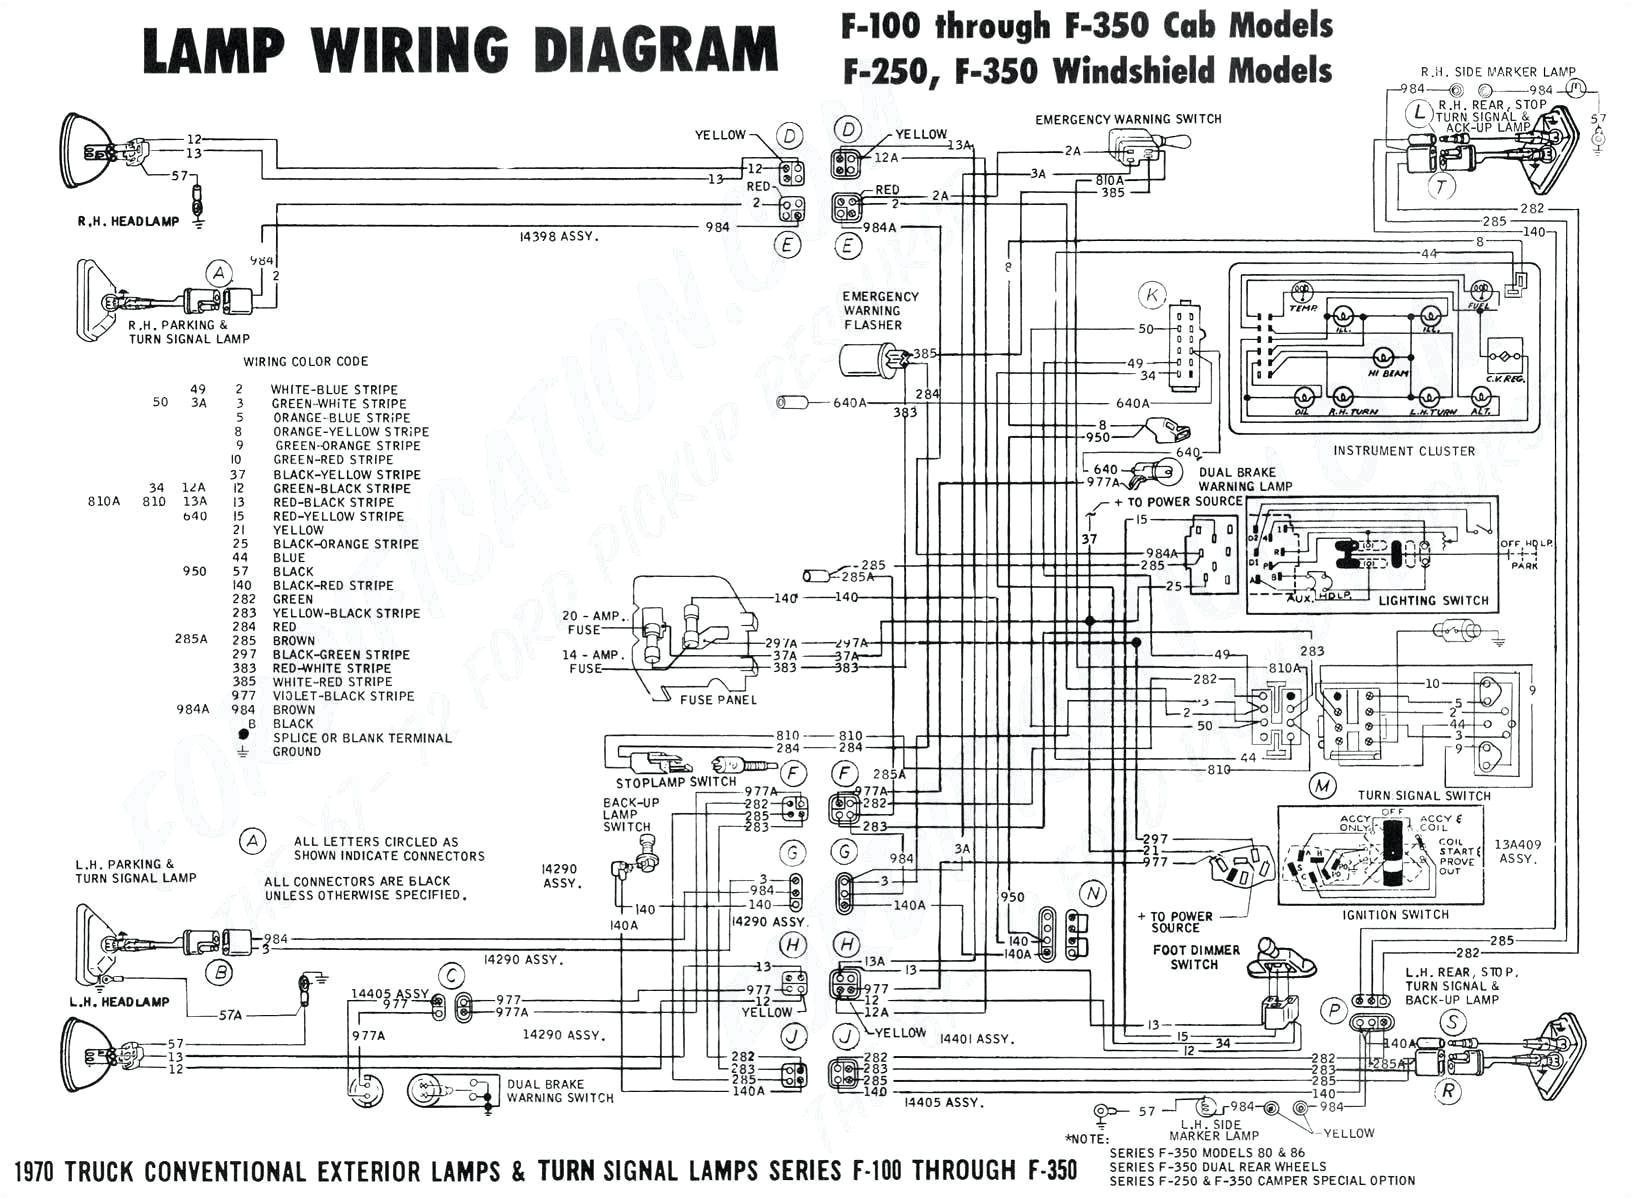 bmw f800gt wiring diagram wiring diagram view bmw f800gt wiring diagram bmw f800gt wiring diagram